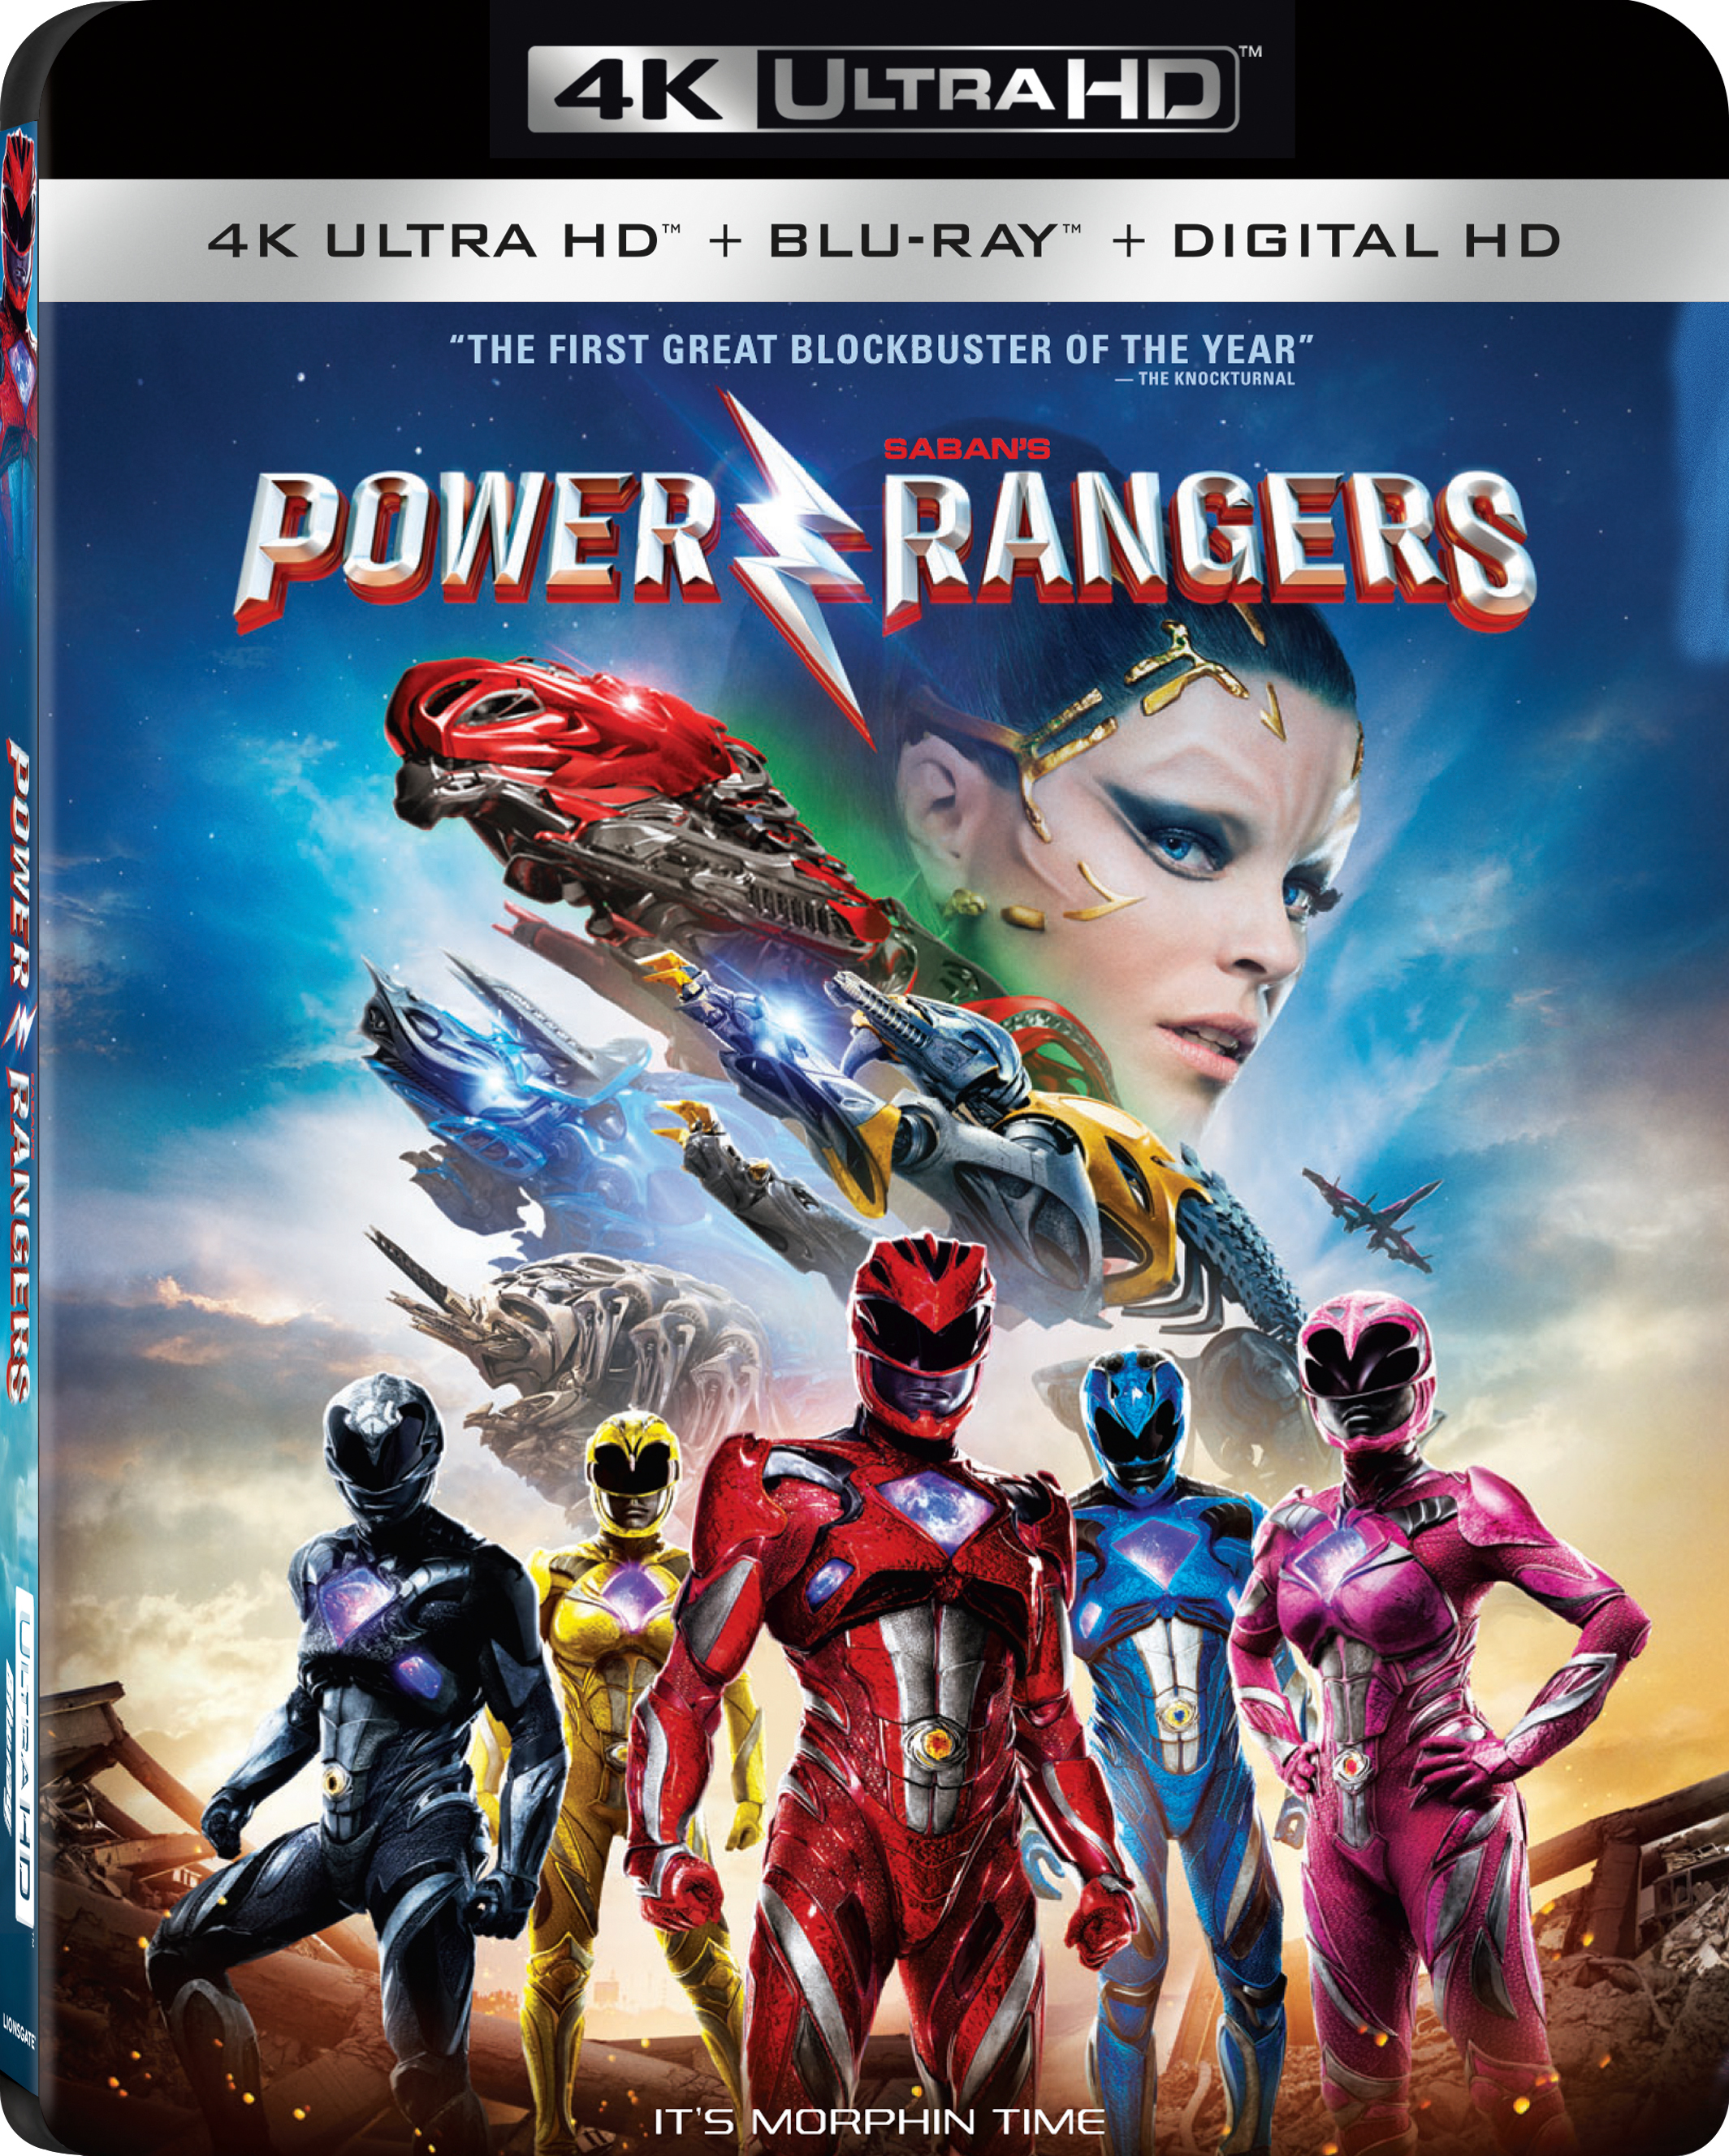 Power Rangers 4K (2017) Ultra HD Blu-ray